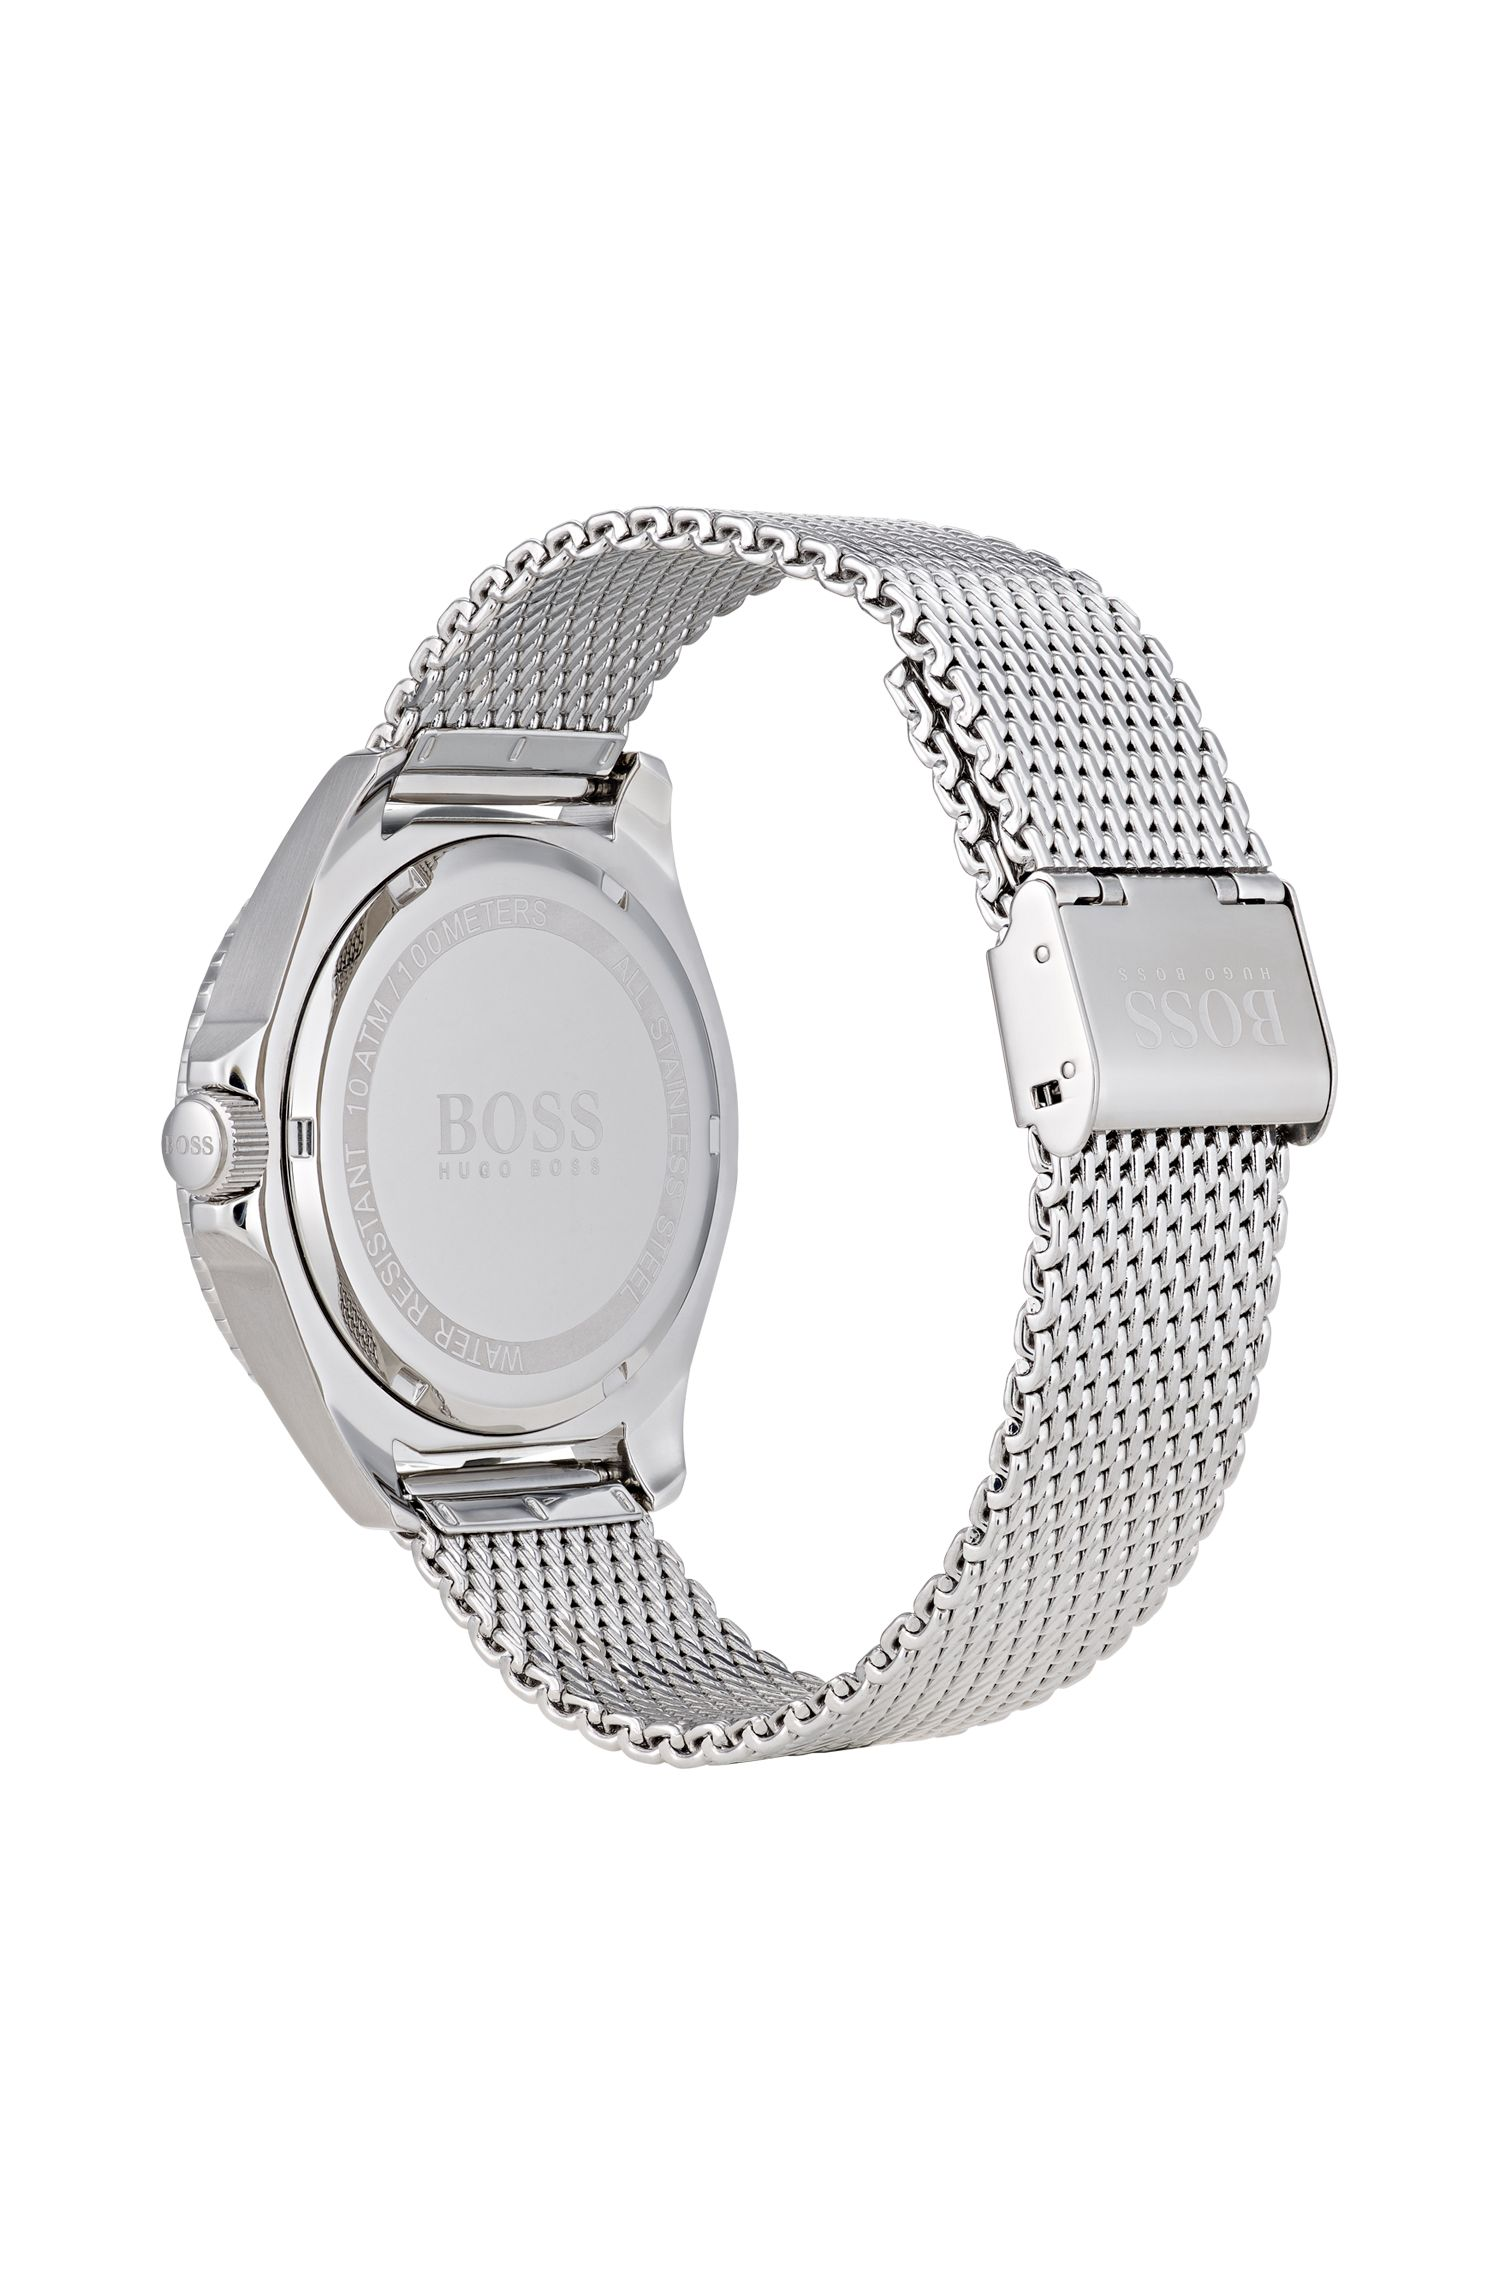 Mesh-Bracelet Watch with Luminova Technology, Assorted-Pre-Pack